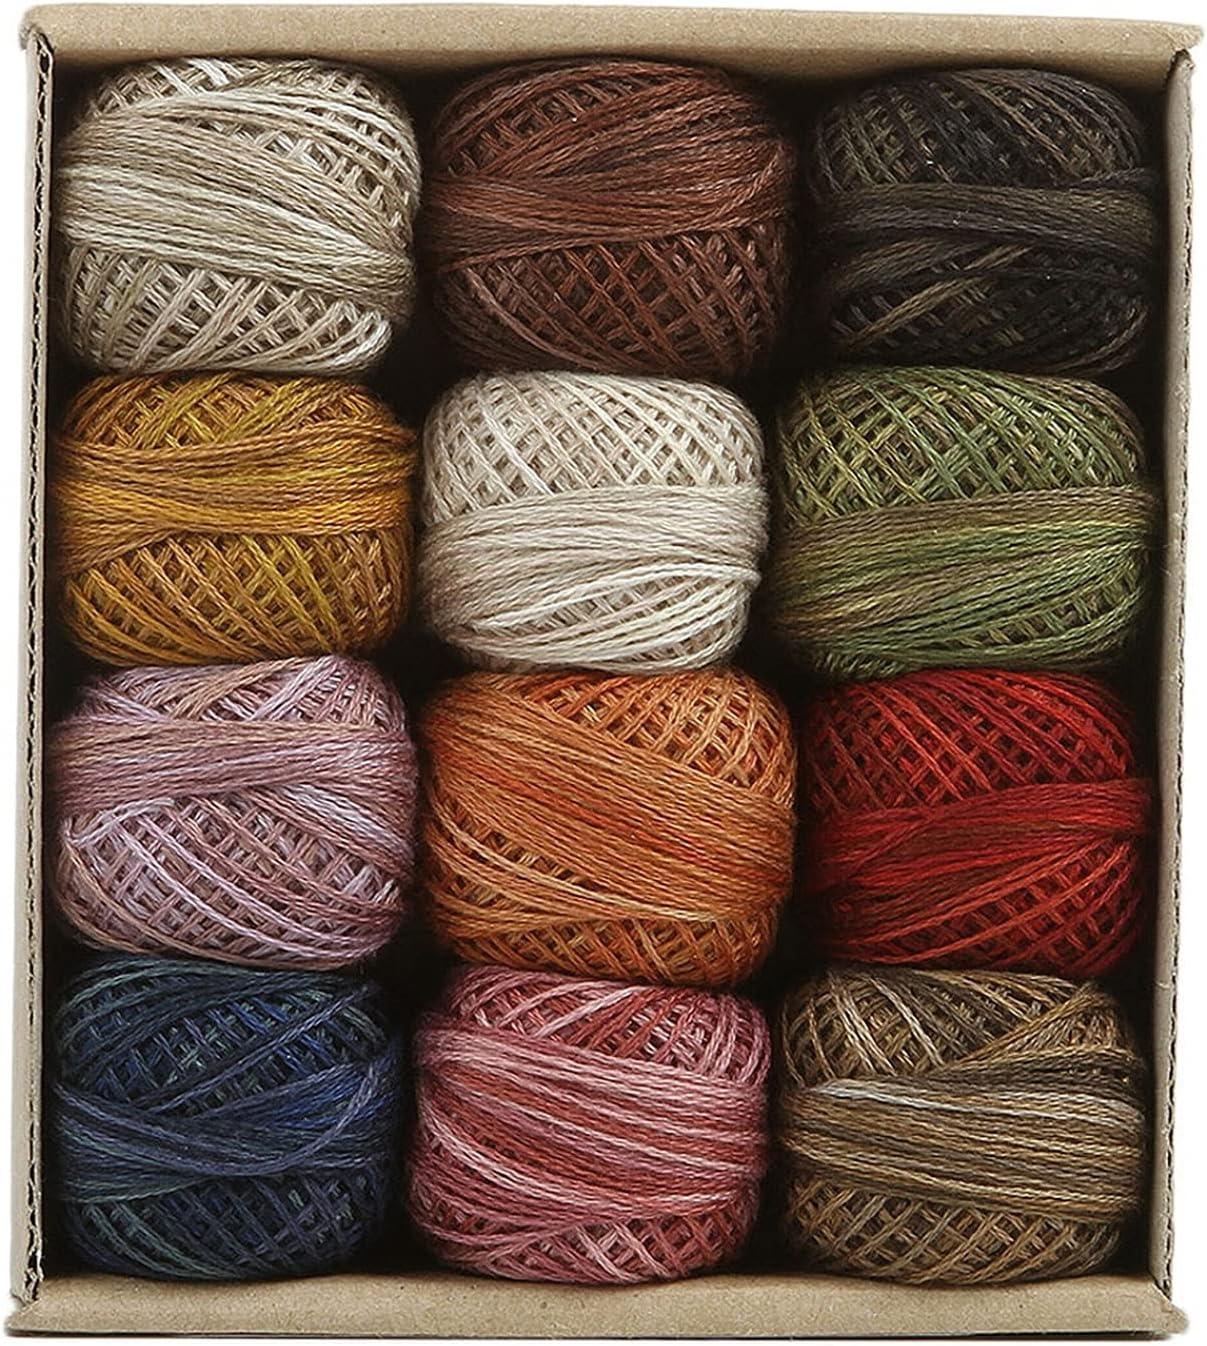 Valdani 3-strand cotton floss - Sampler Vintage 2021 spring and summer Max 54% OFF new J. Hues Paton